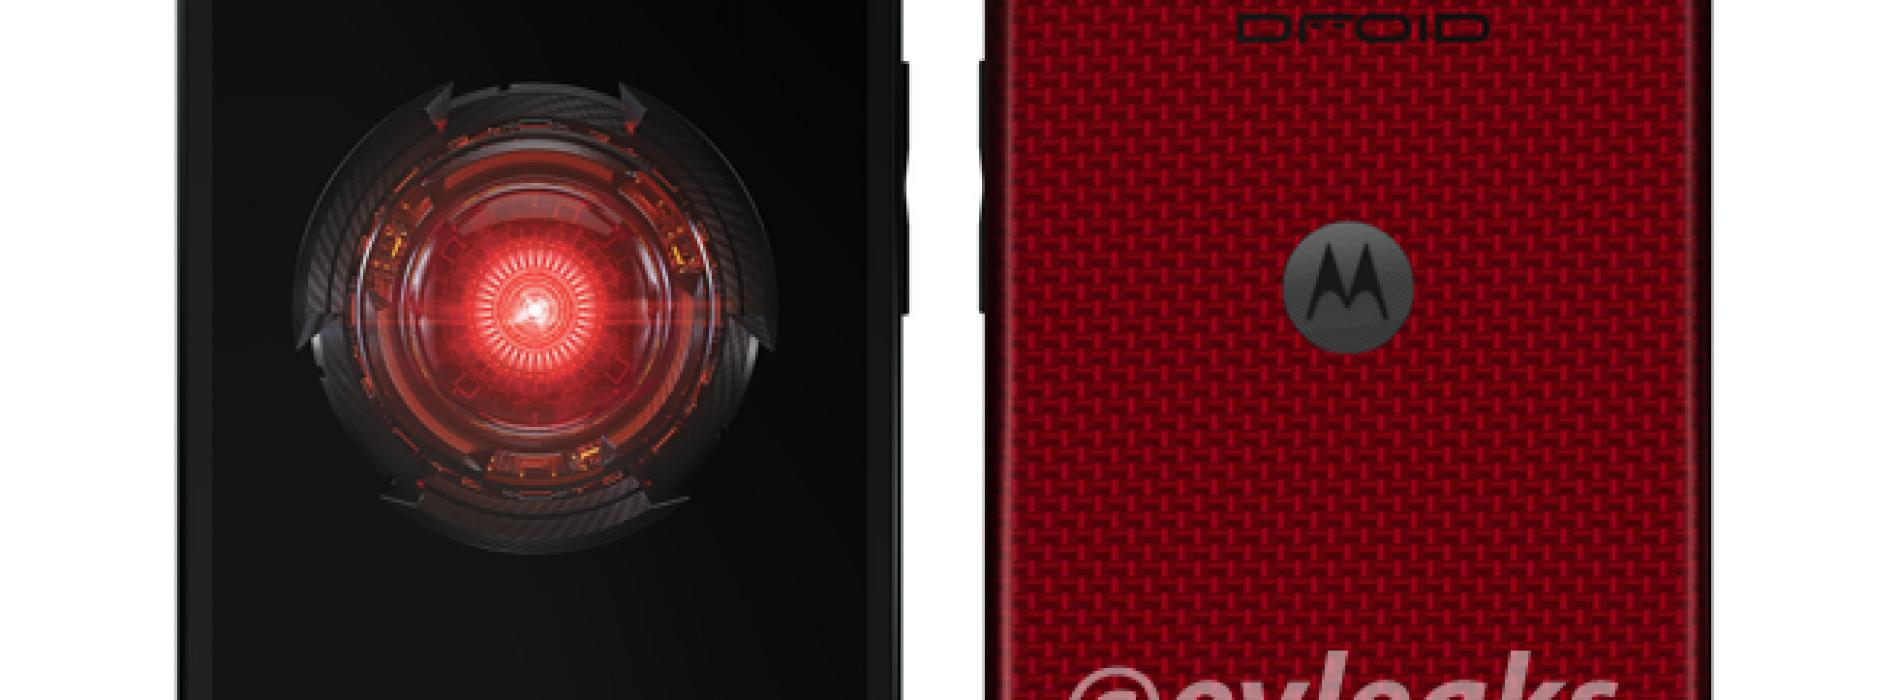 Motorola Droid Mini pops up dressed in red